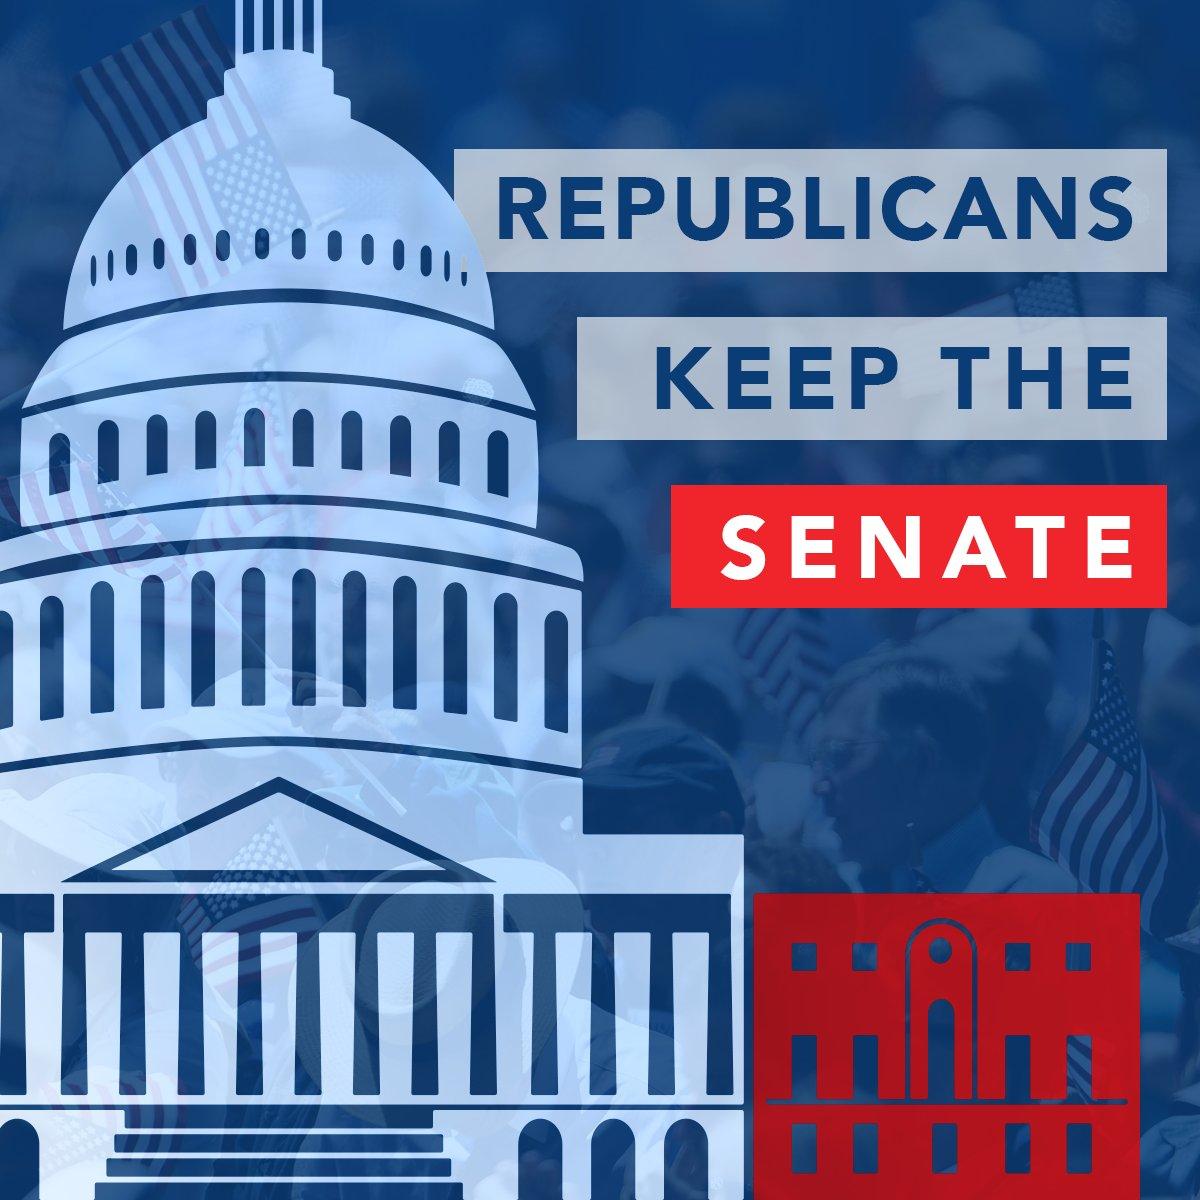 028f80a9649c92 GOP GOP Congratulations to the  SenateGOP for maintaining their majority!  https   t.co dqI4ypUuOR 2 jaar geleden